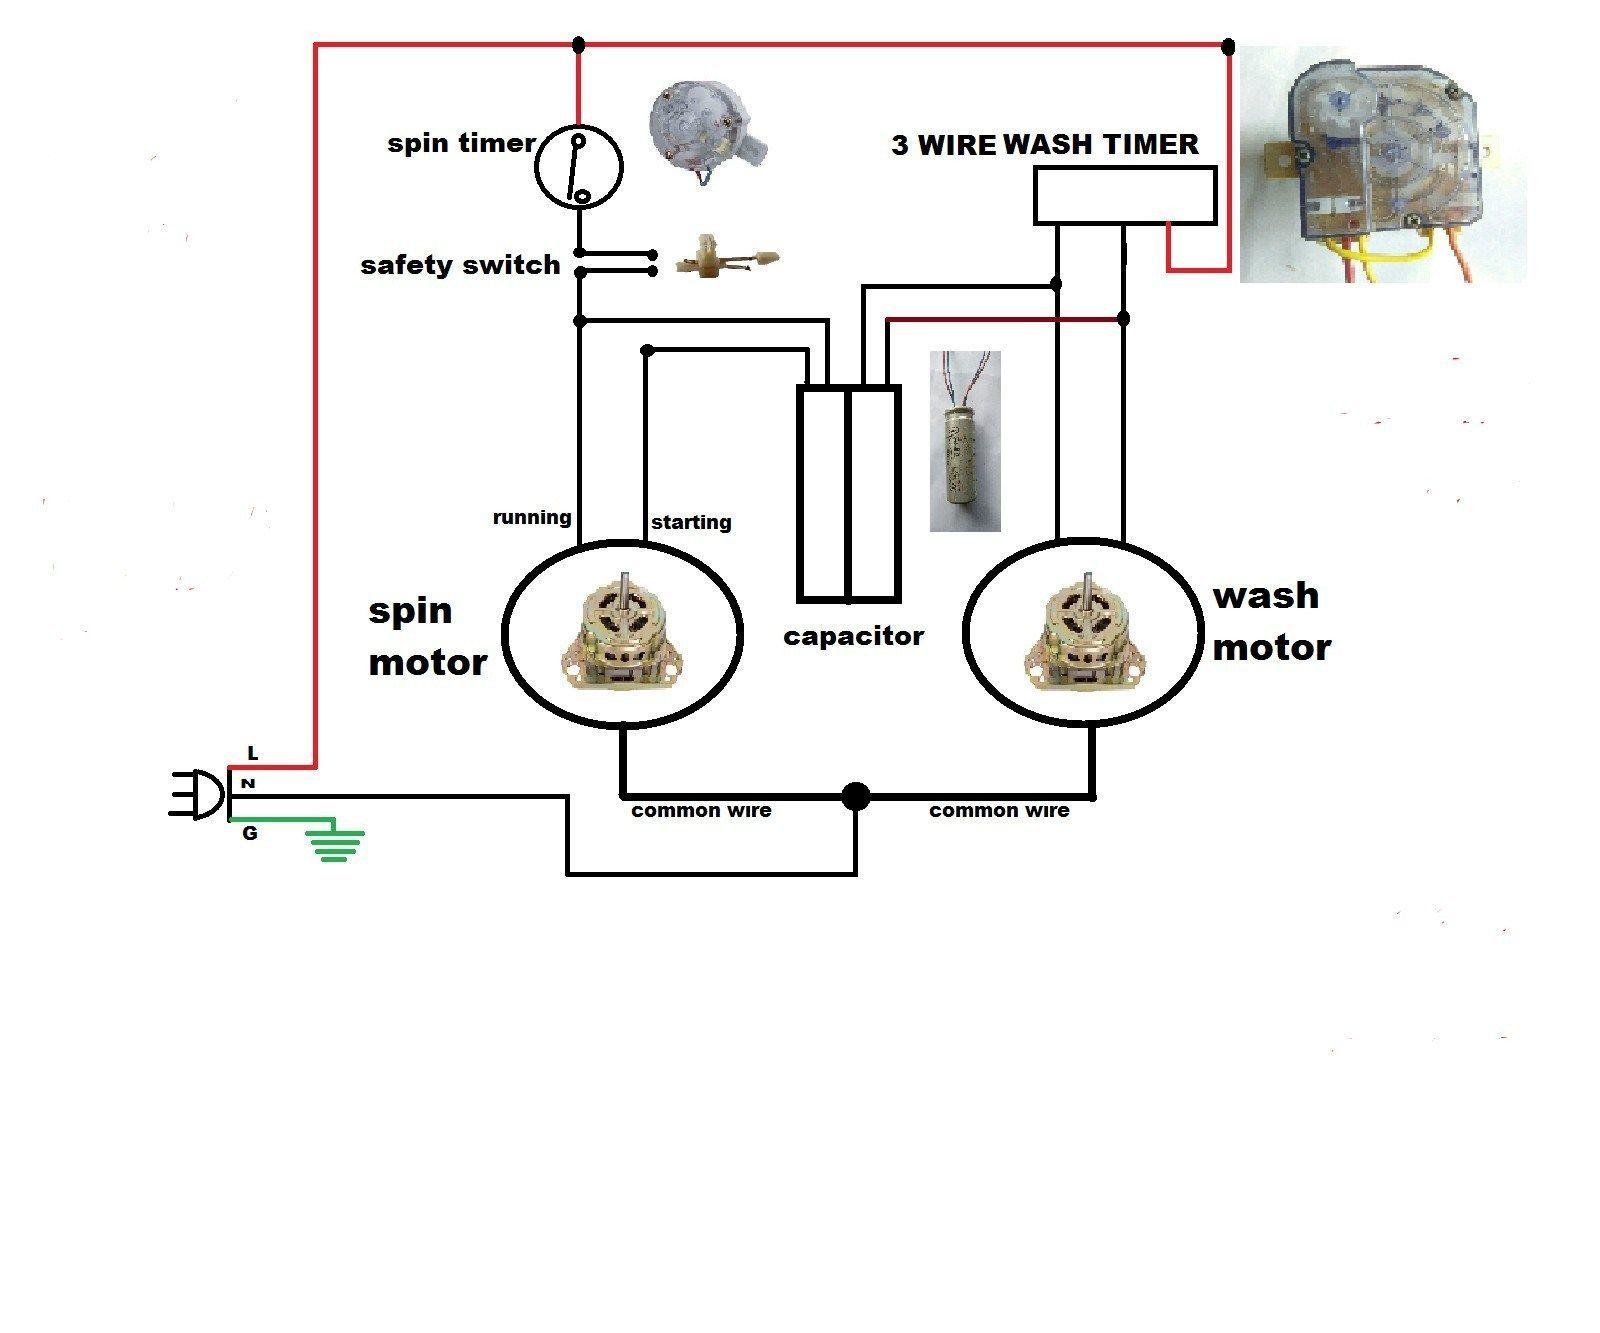 Fortress Wiring Diagram In 2020 Washing Machine Motor Whirlpool Washing Machine Washing Machine